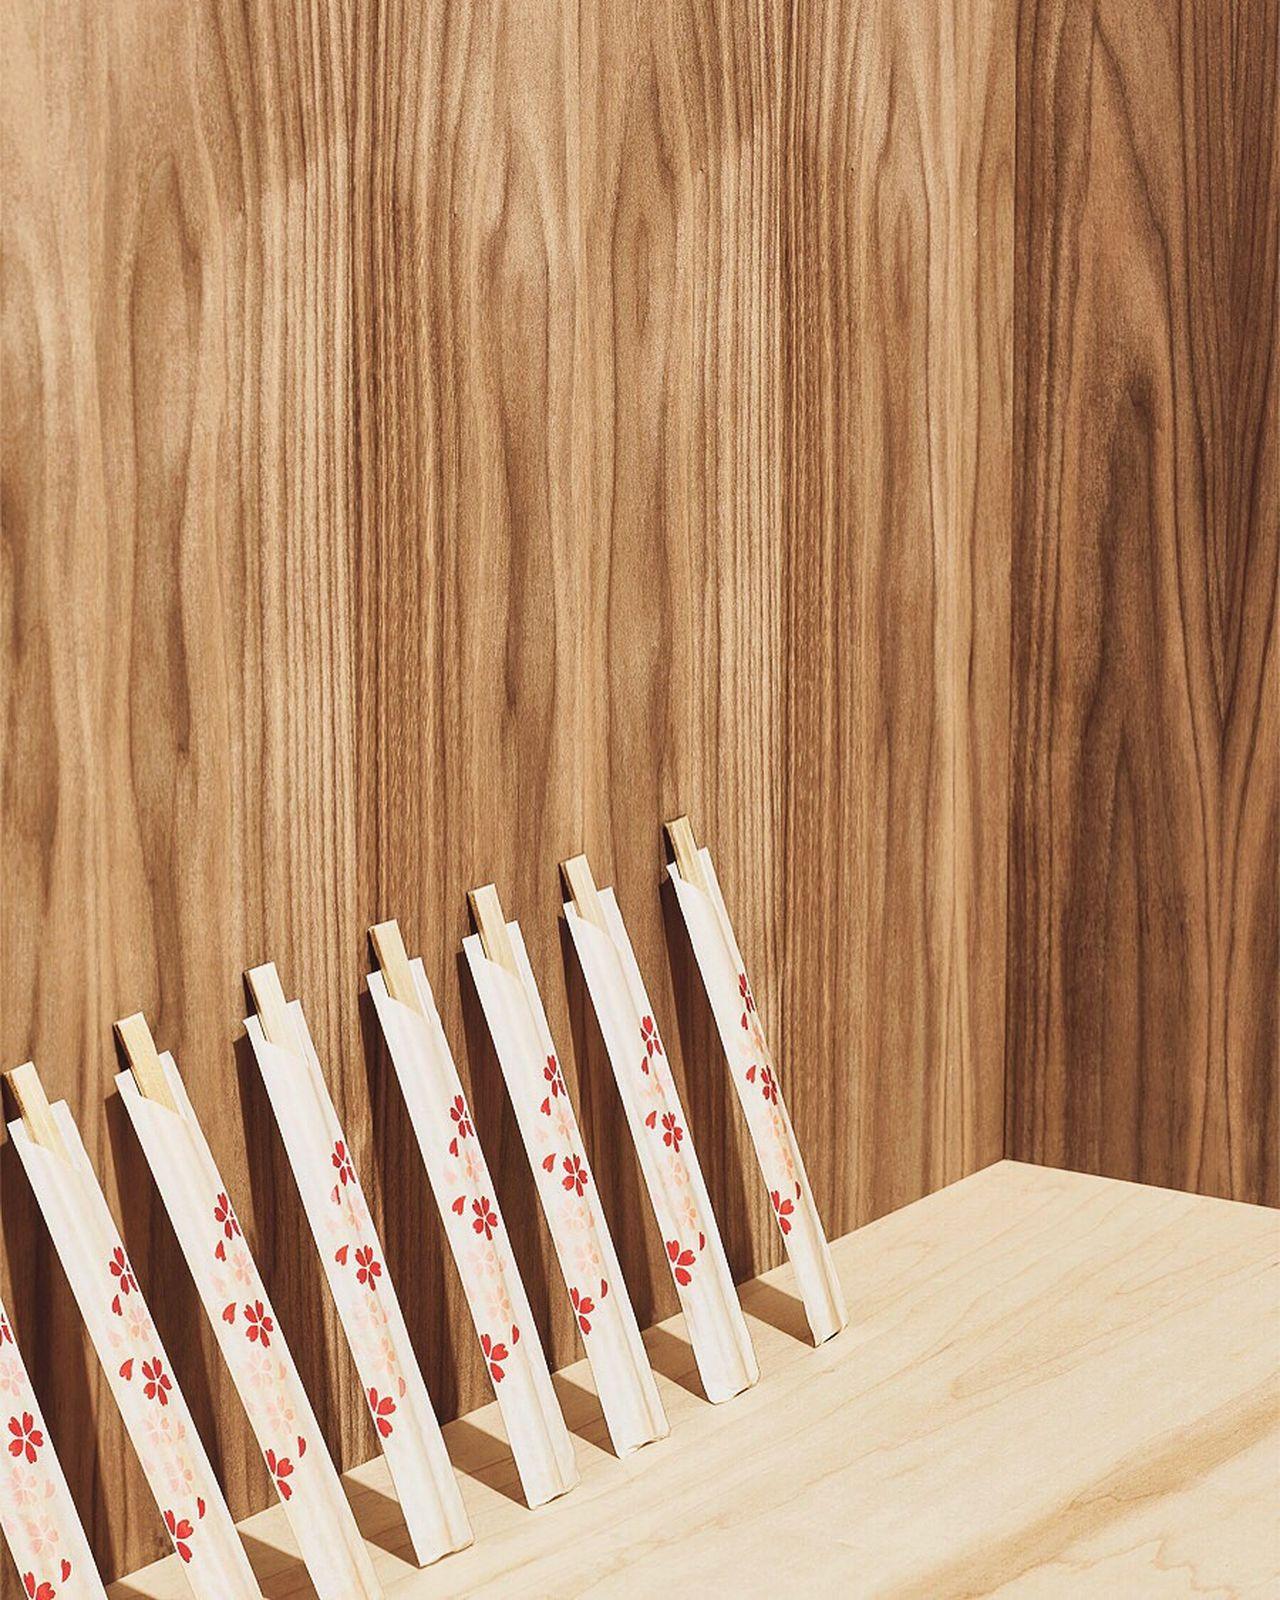 Wood - Material No People Shapes And Forms Wood Grain Fresh on Market 2017 Chopsticks Chop Chop Soldier Daiso Uniform Studio Shot